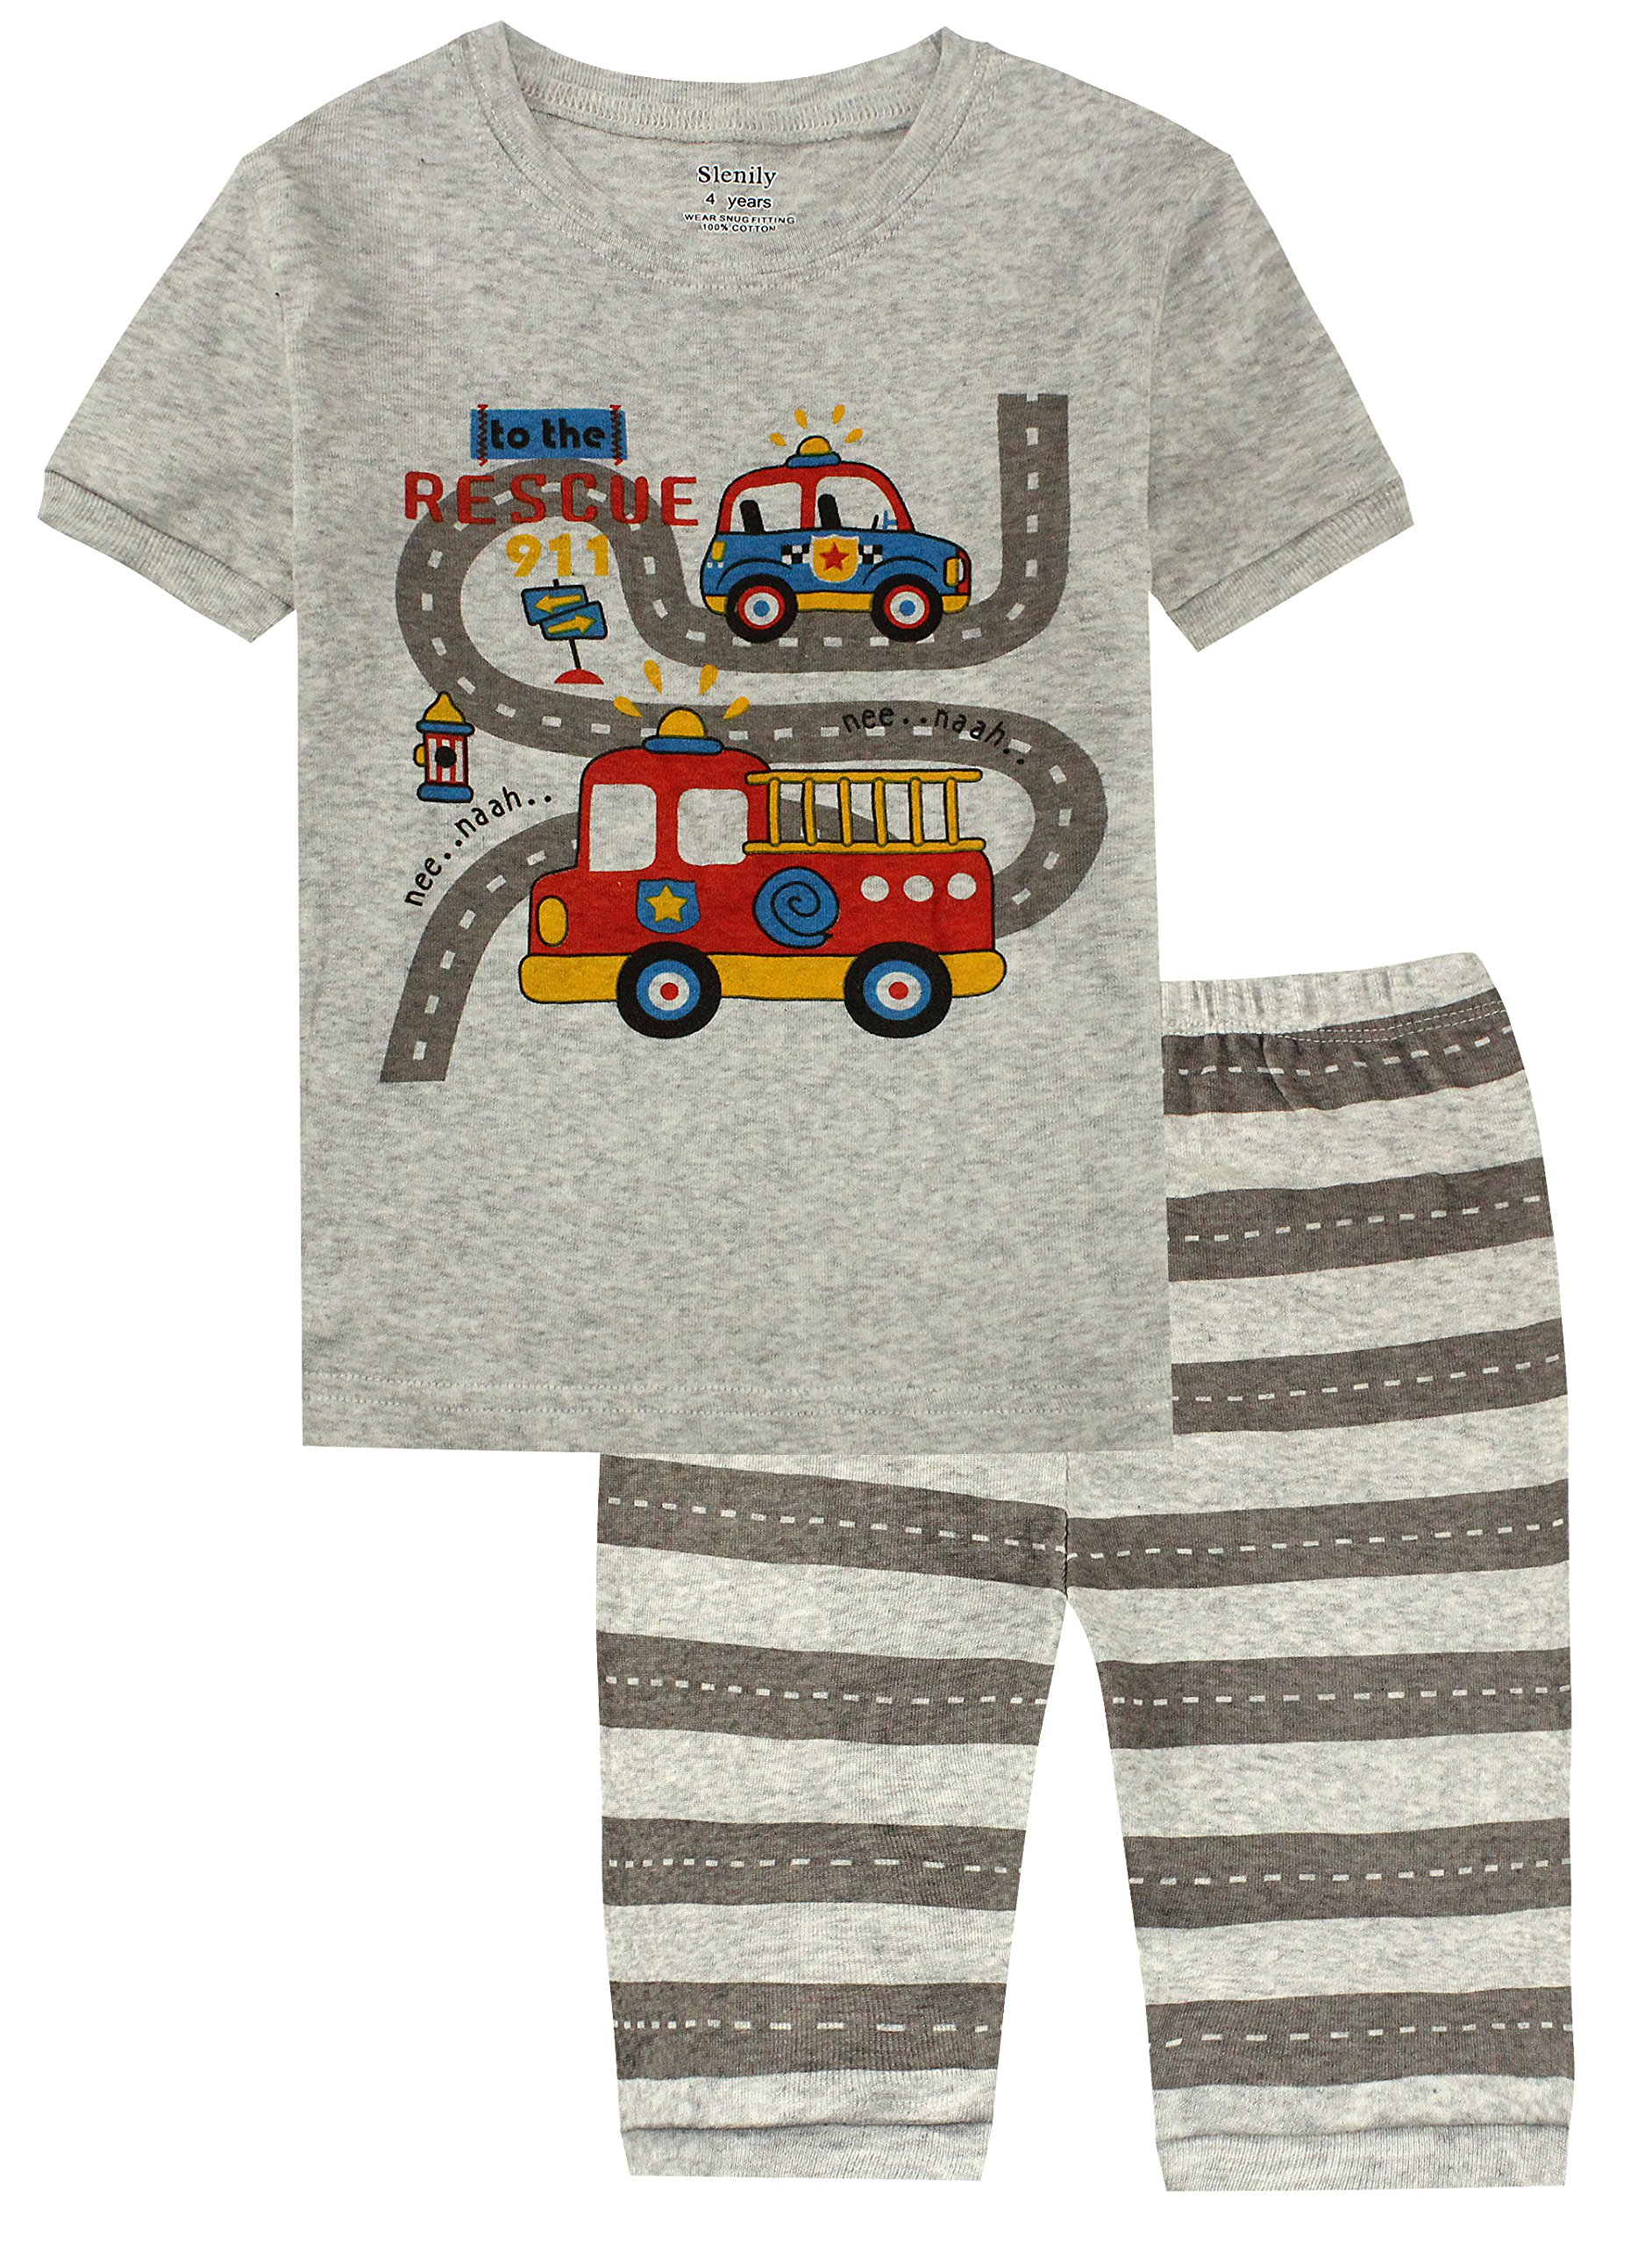 Slenily Little&Big Boys Pajamas 100% Cotton Kids Sleepwear Toddler Pjs Shorts Set Size 5